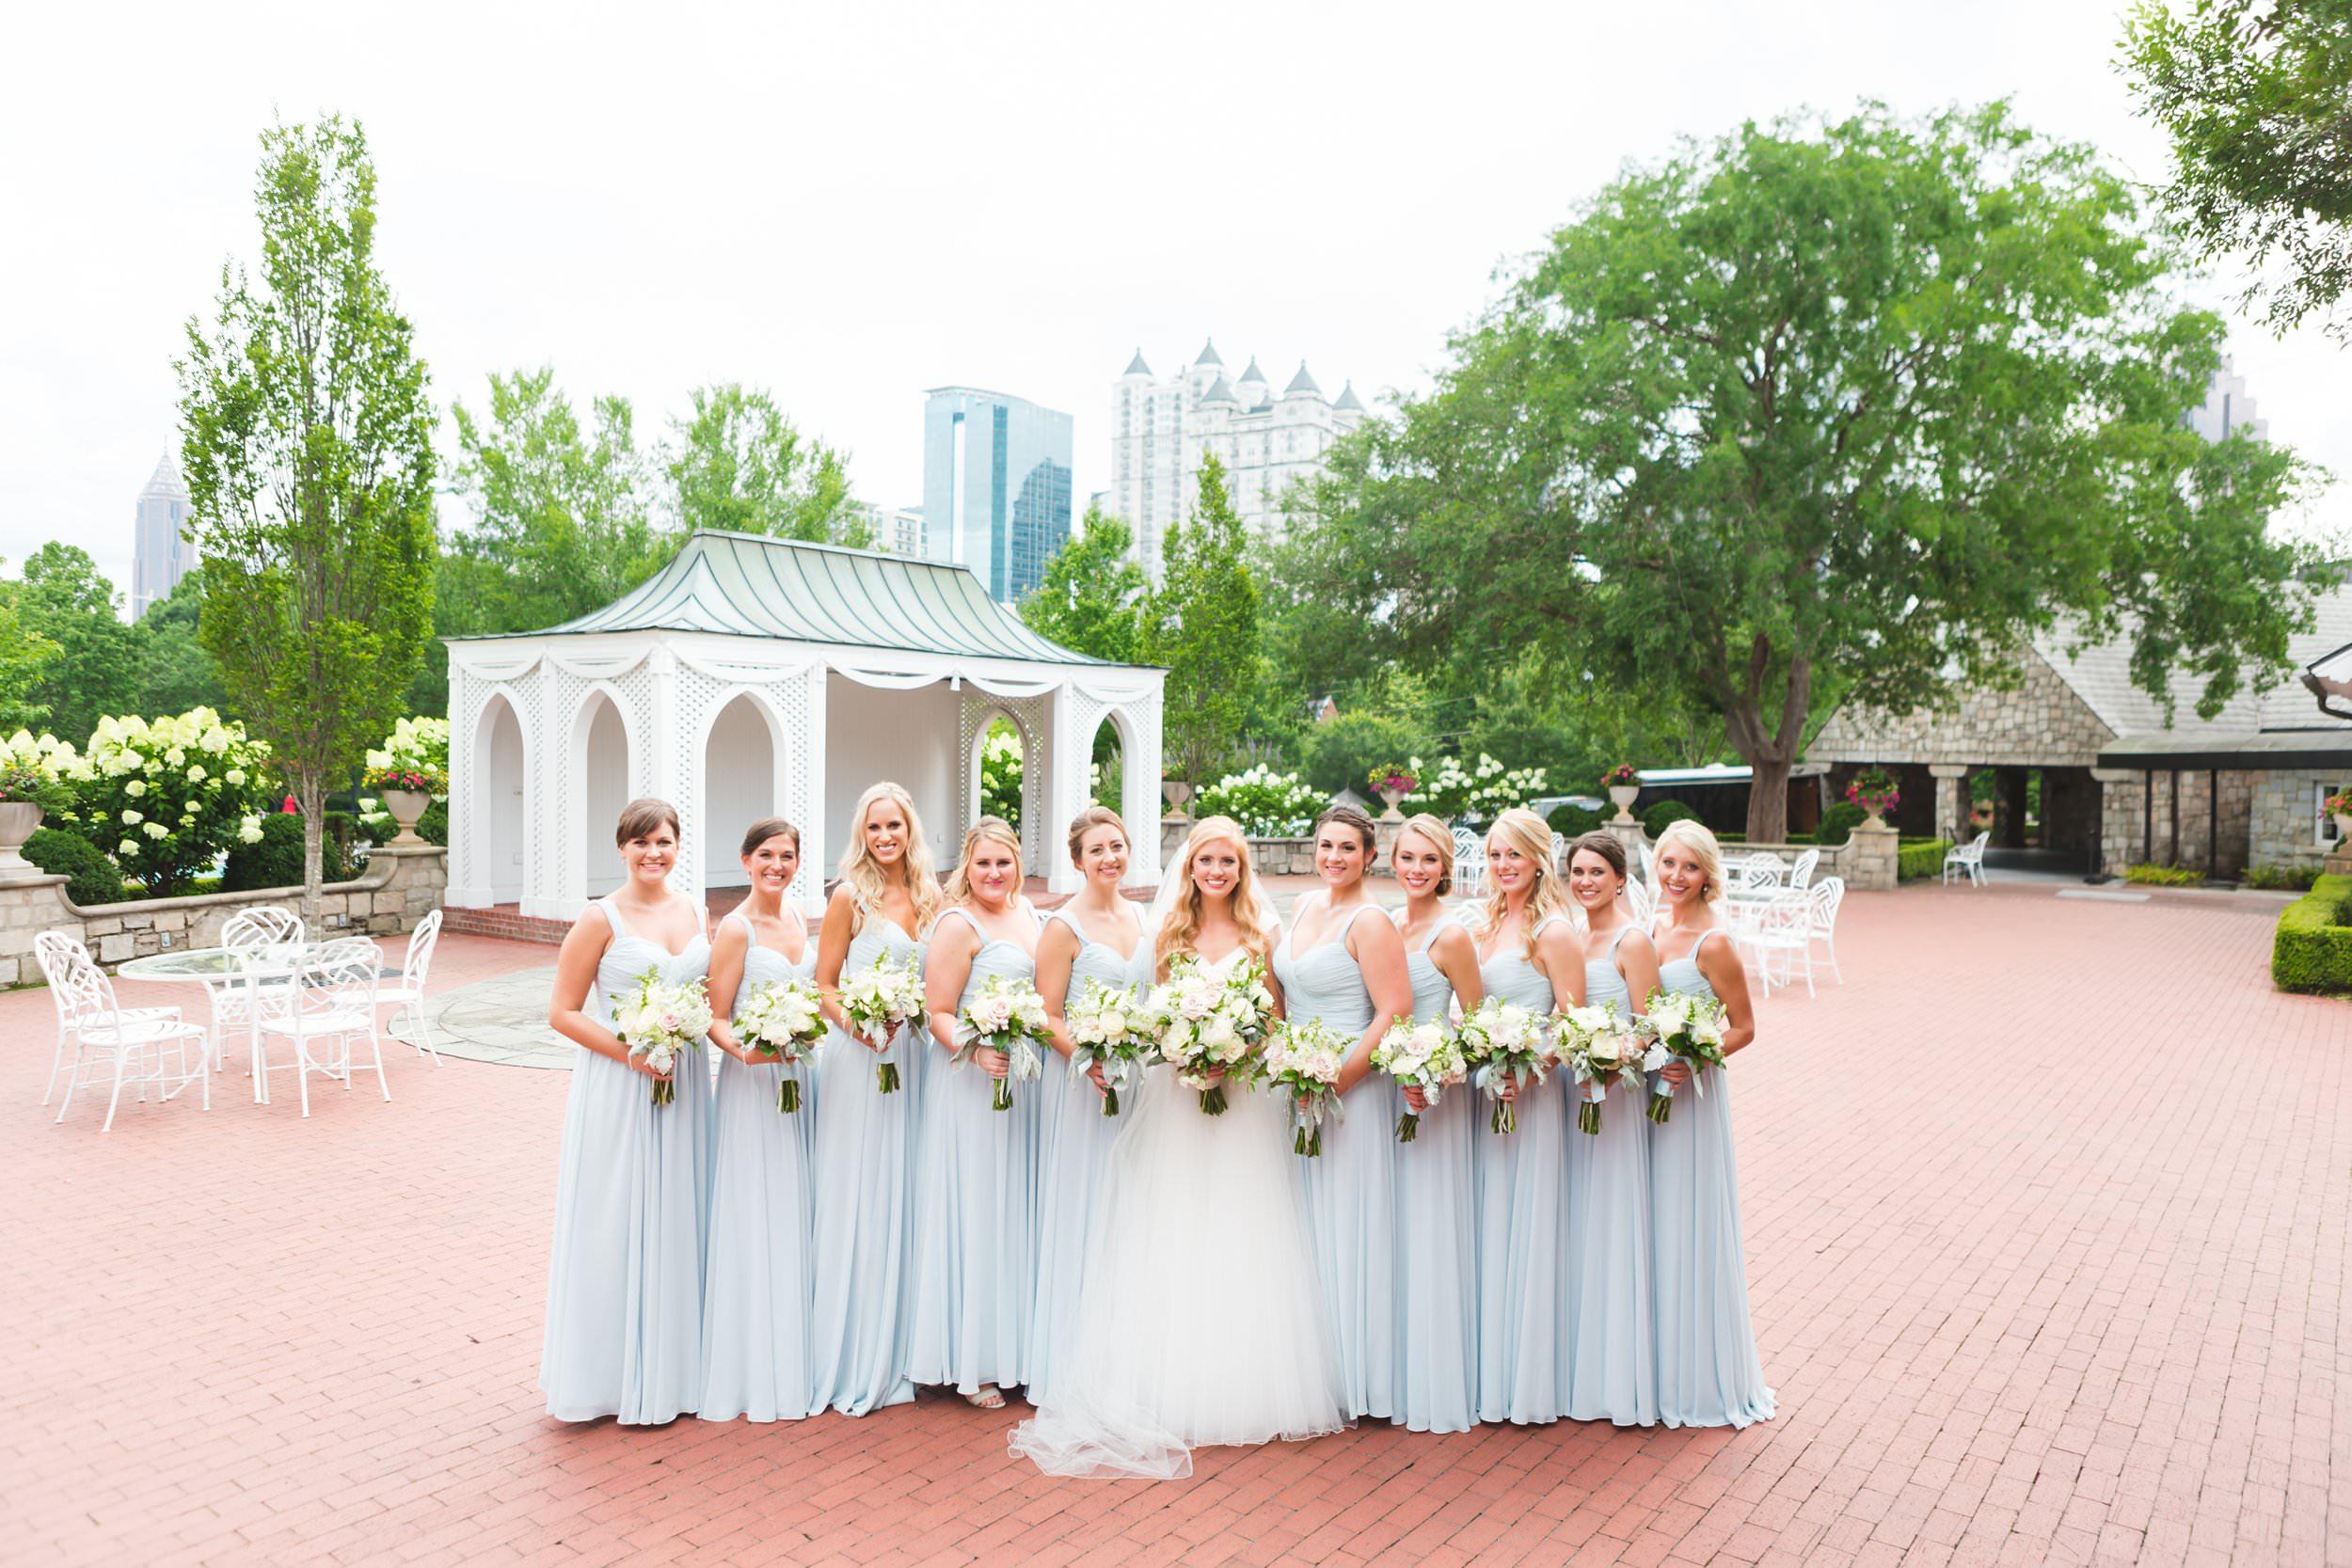 Piedmont-Driving-Club-Wedding-Photos020.jpg